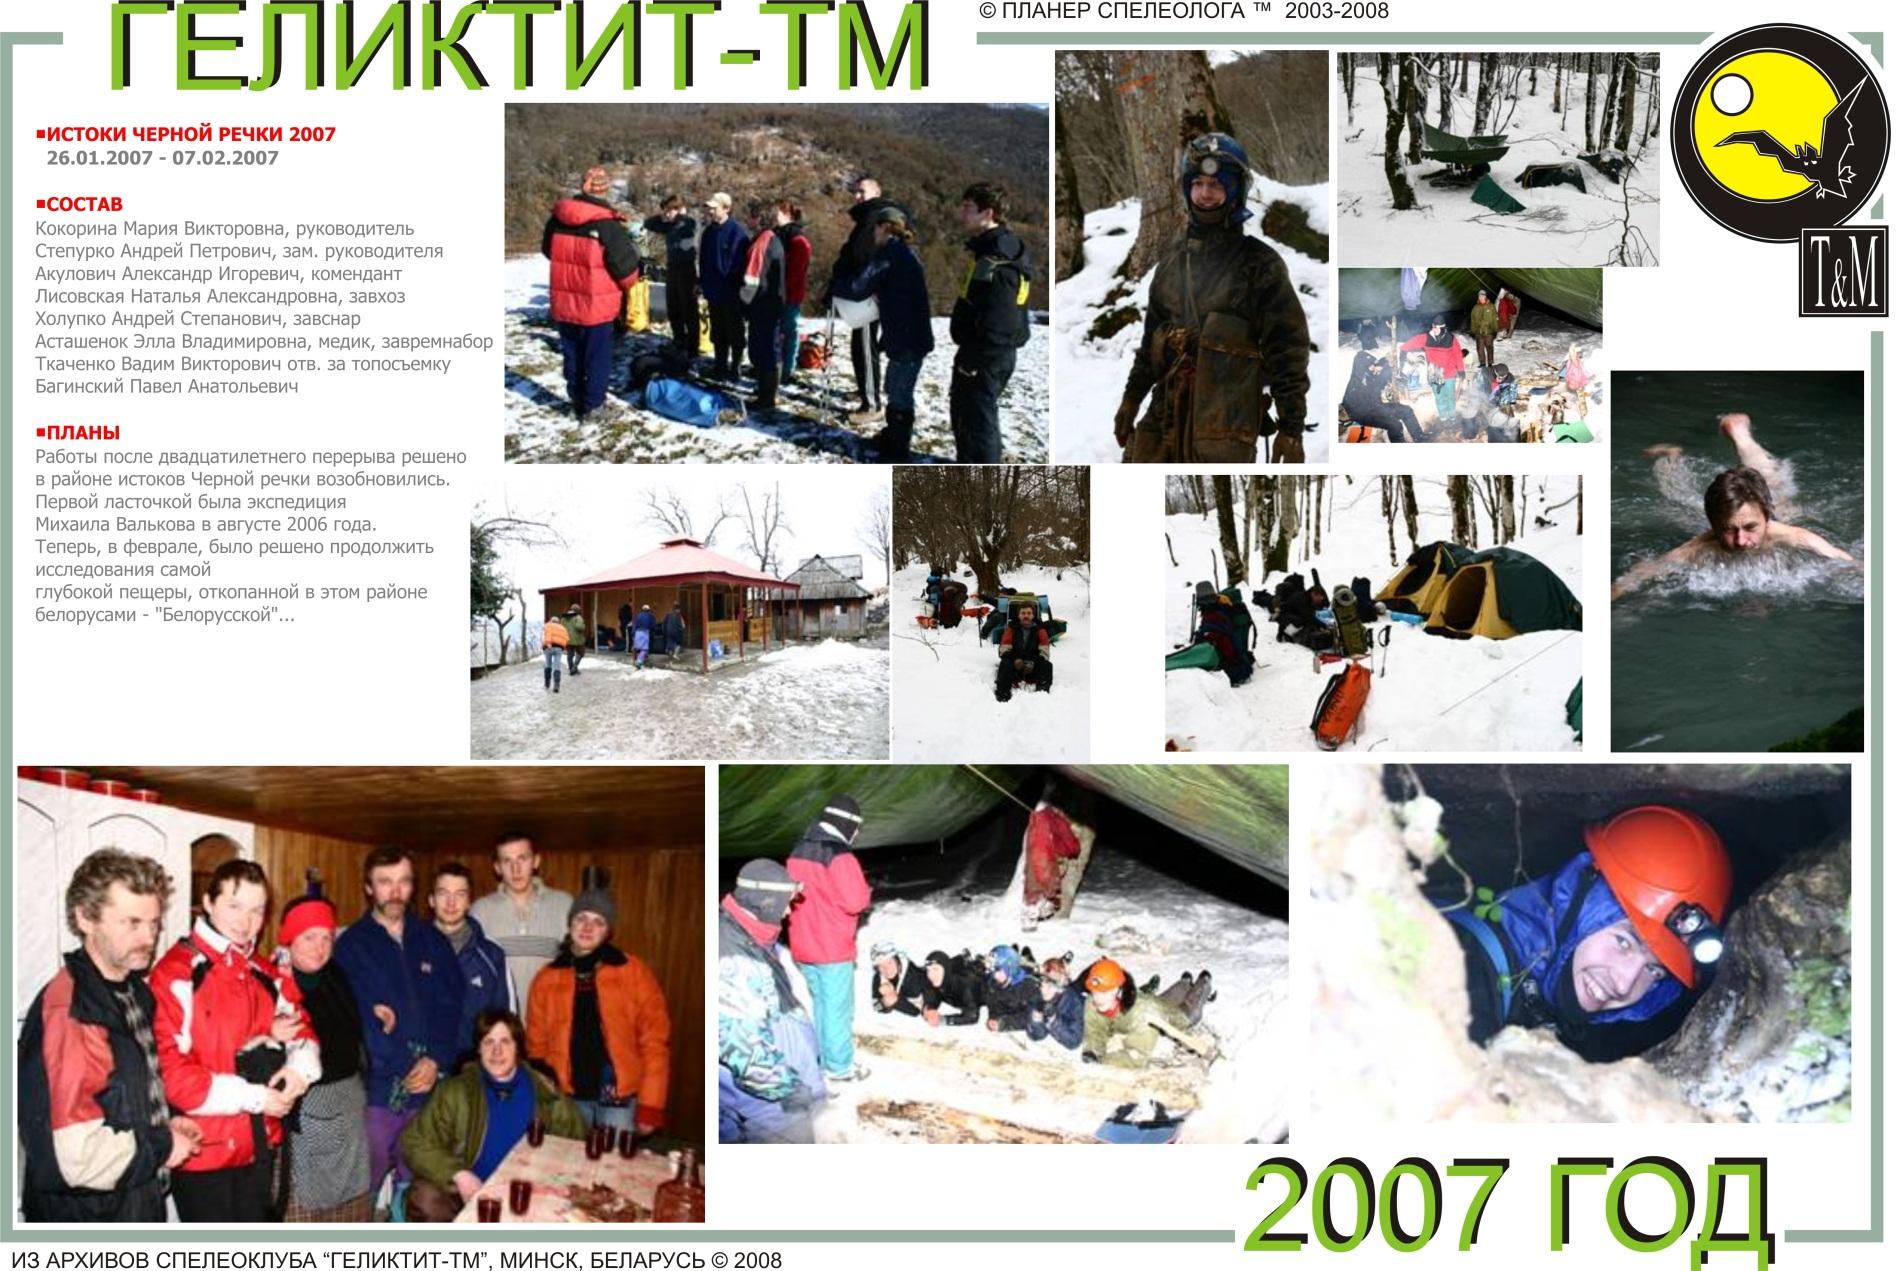 Черная Речка 2007 год